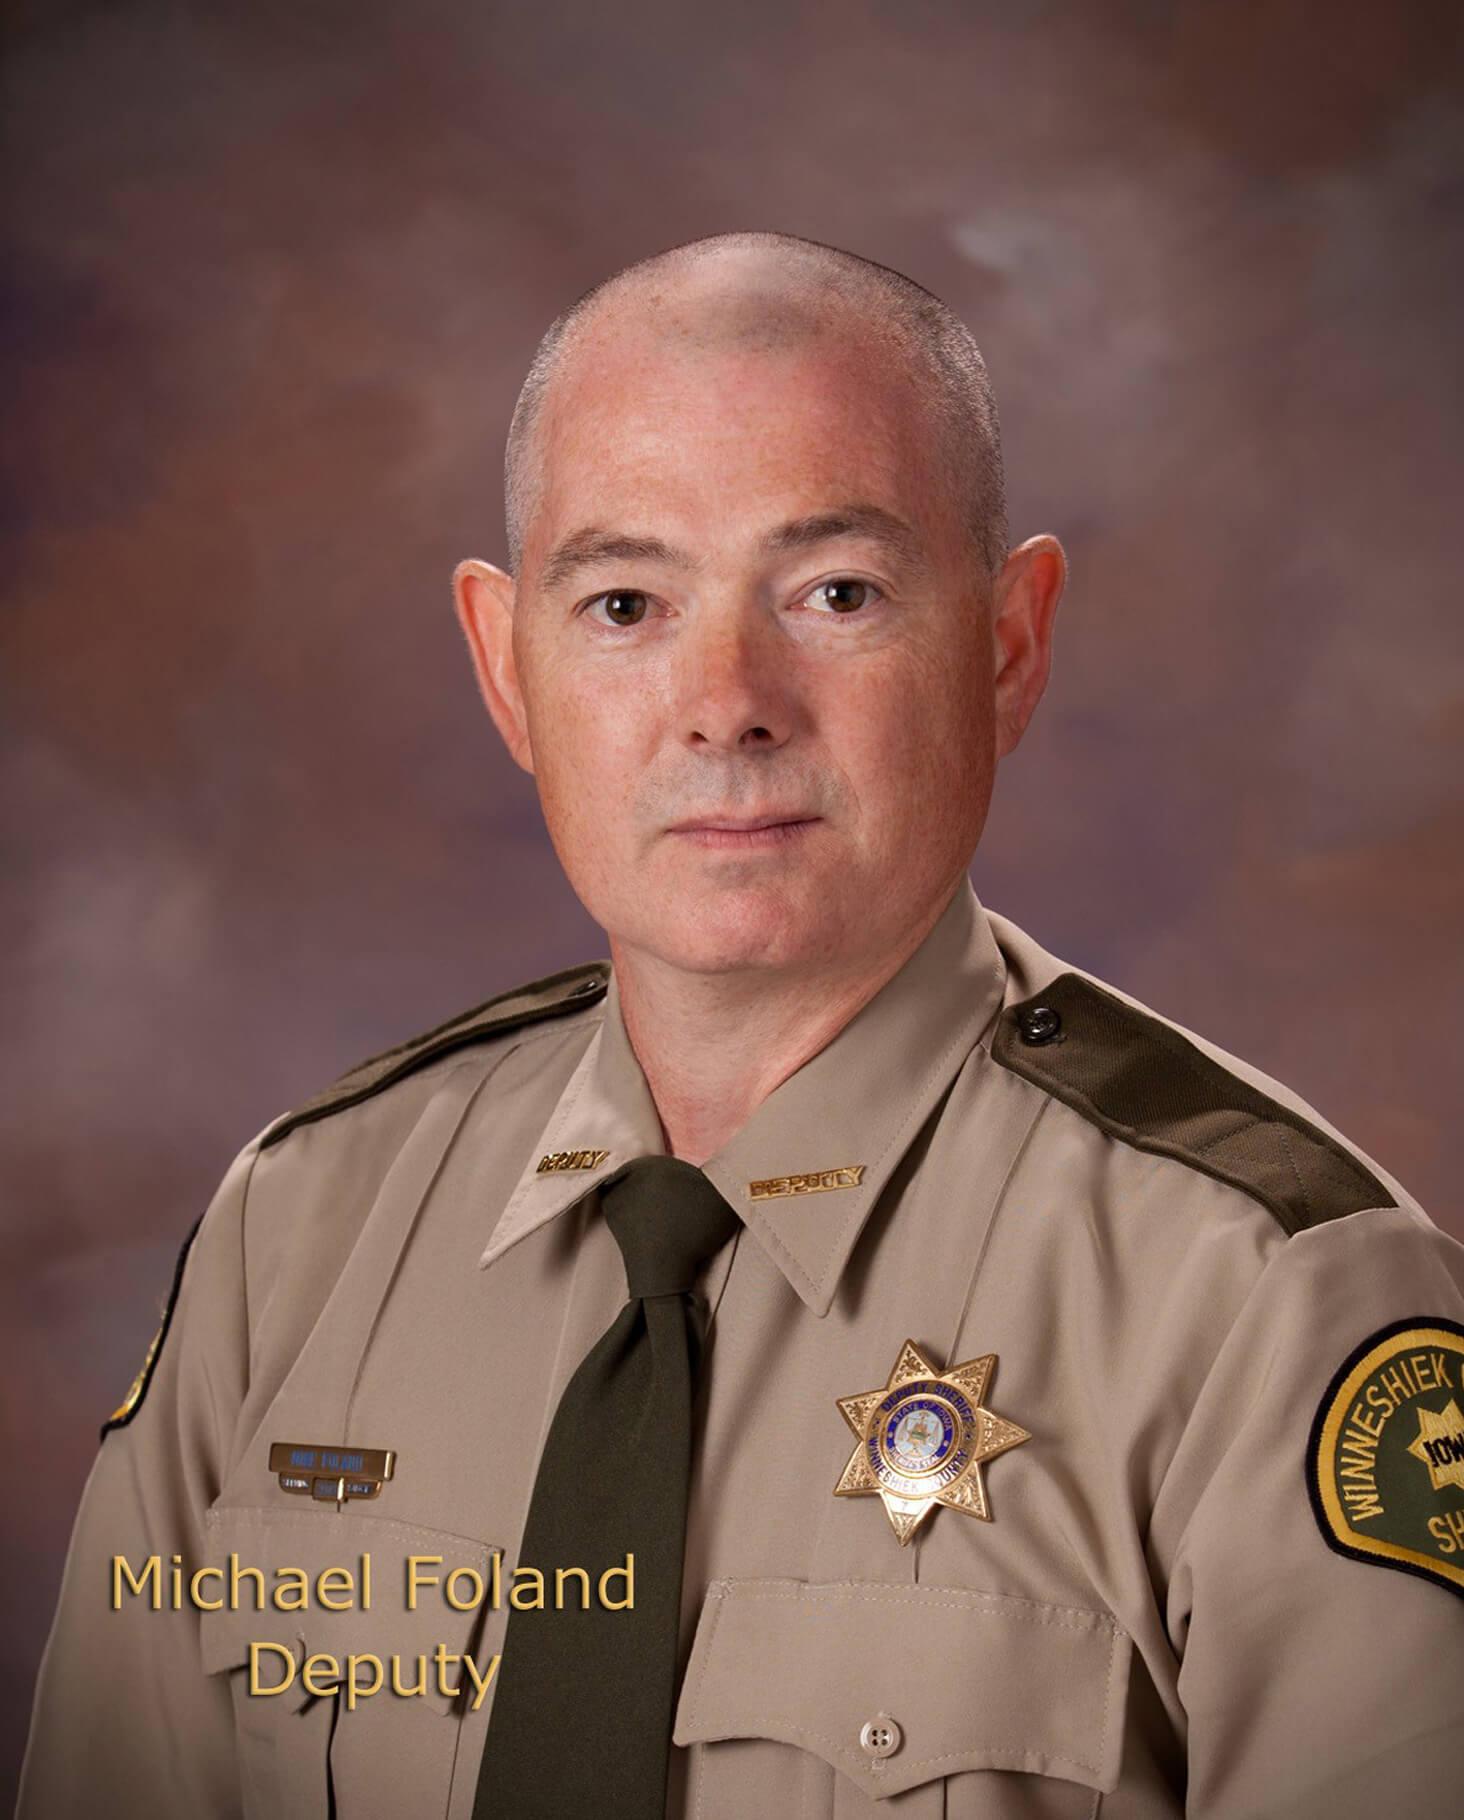 Mike Foland, Deputy Sheriff